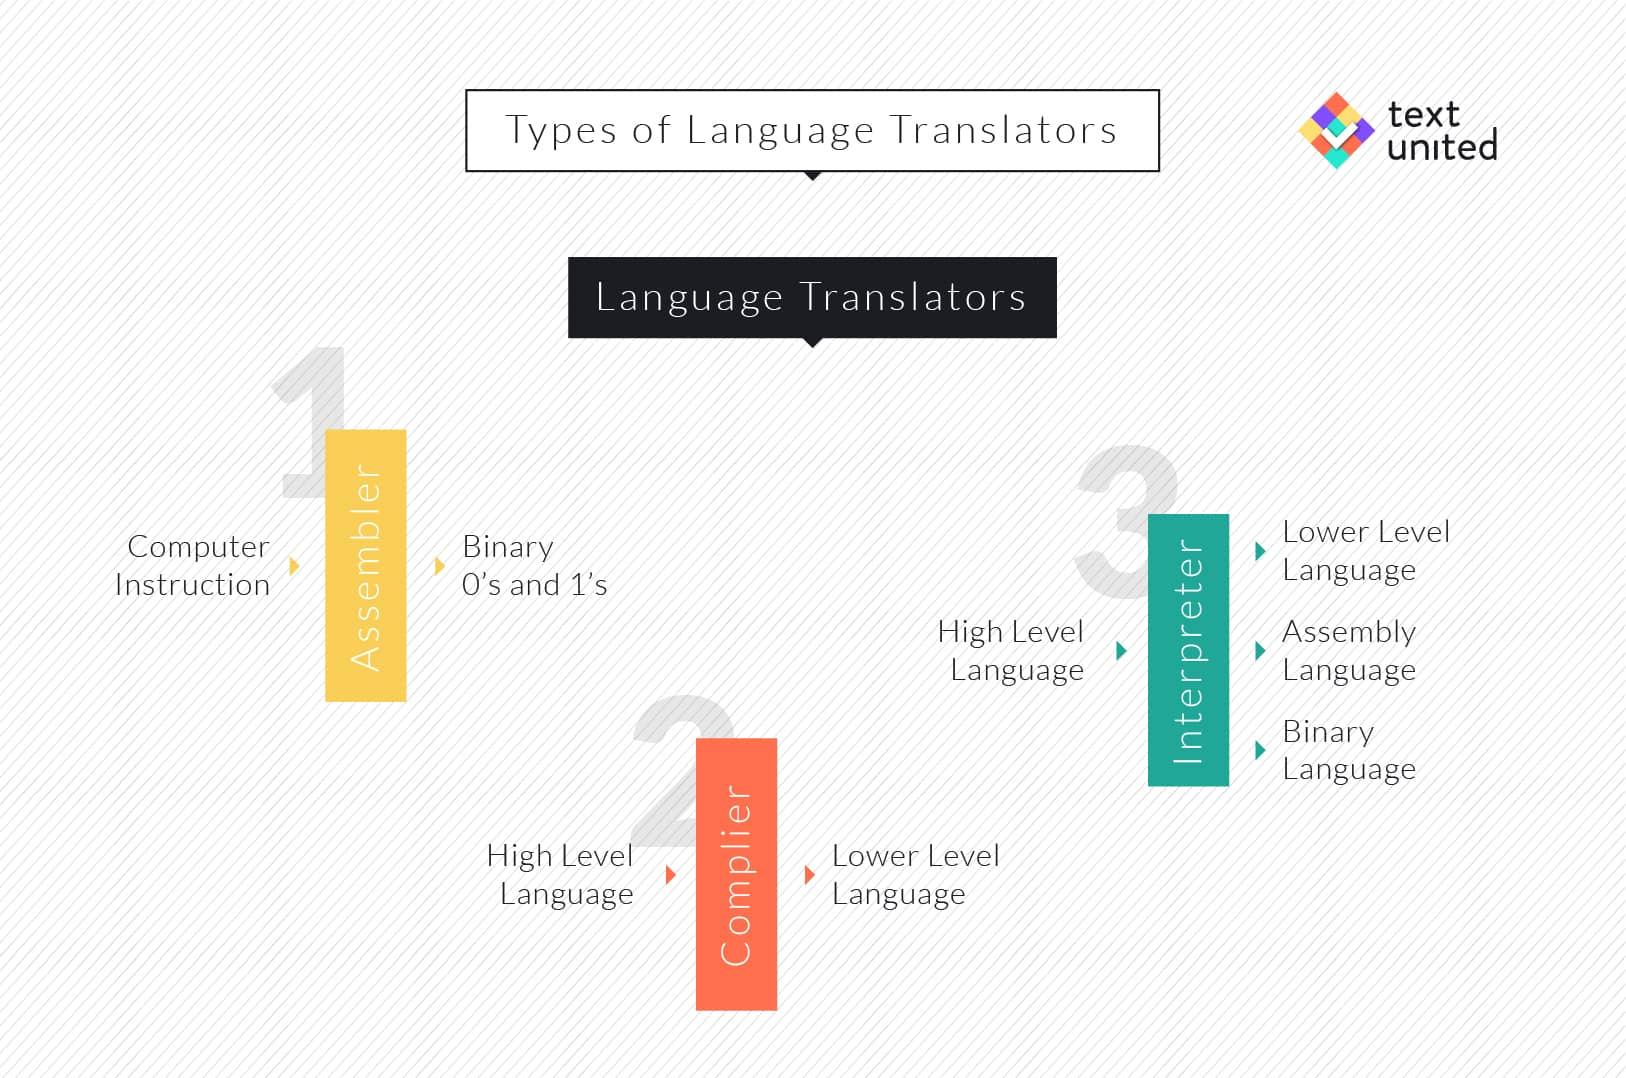 Type of language Translators